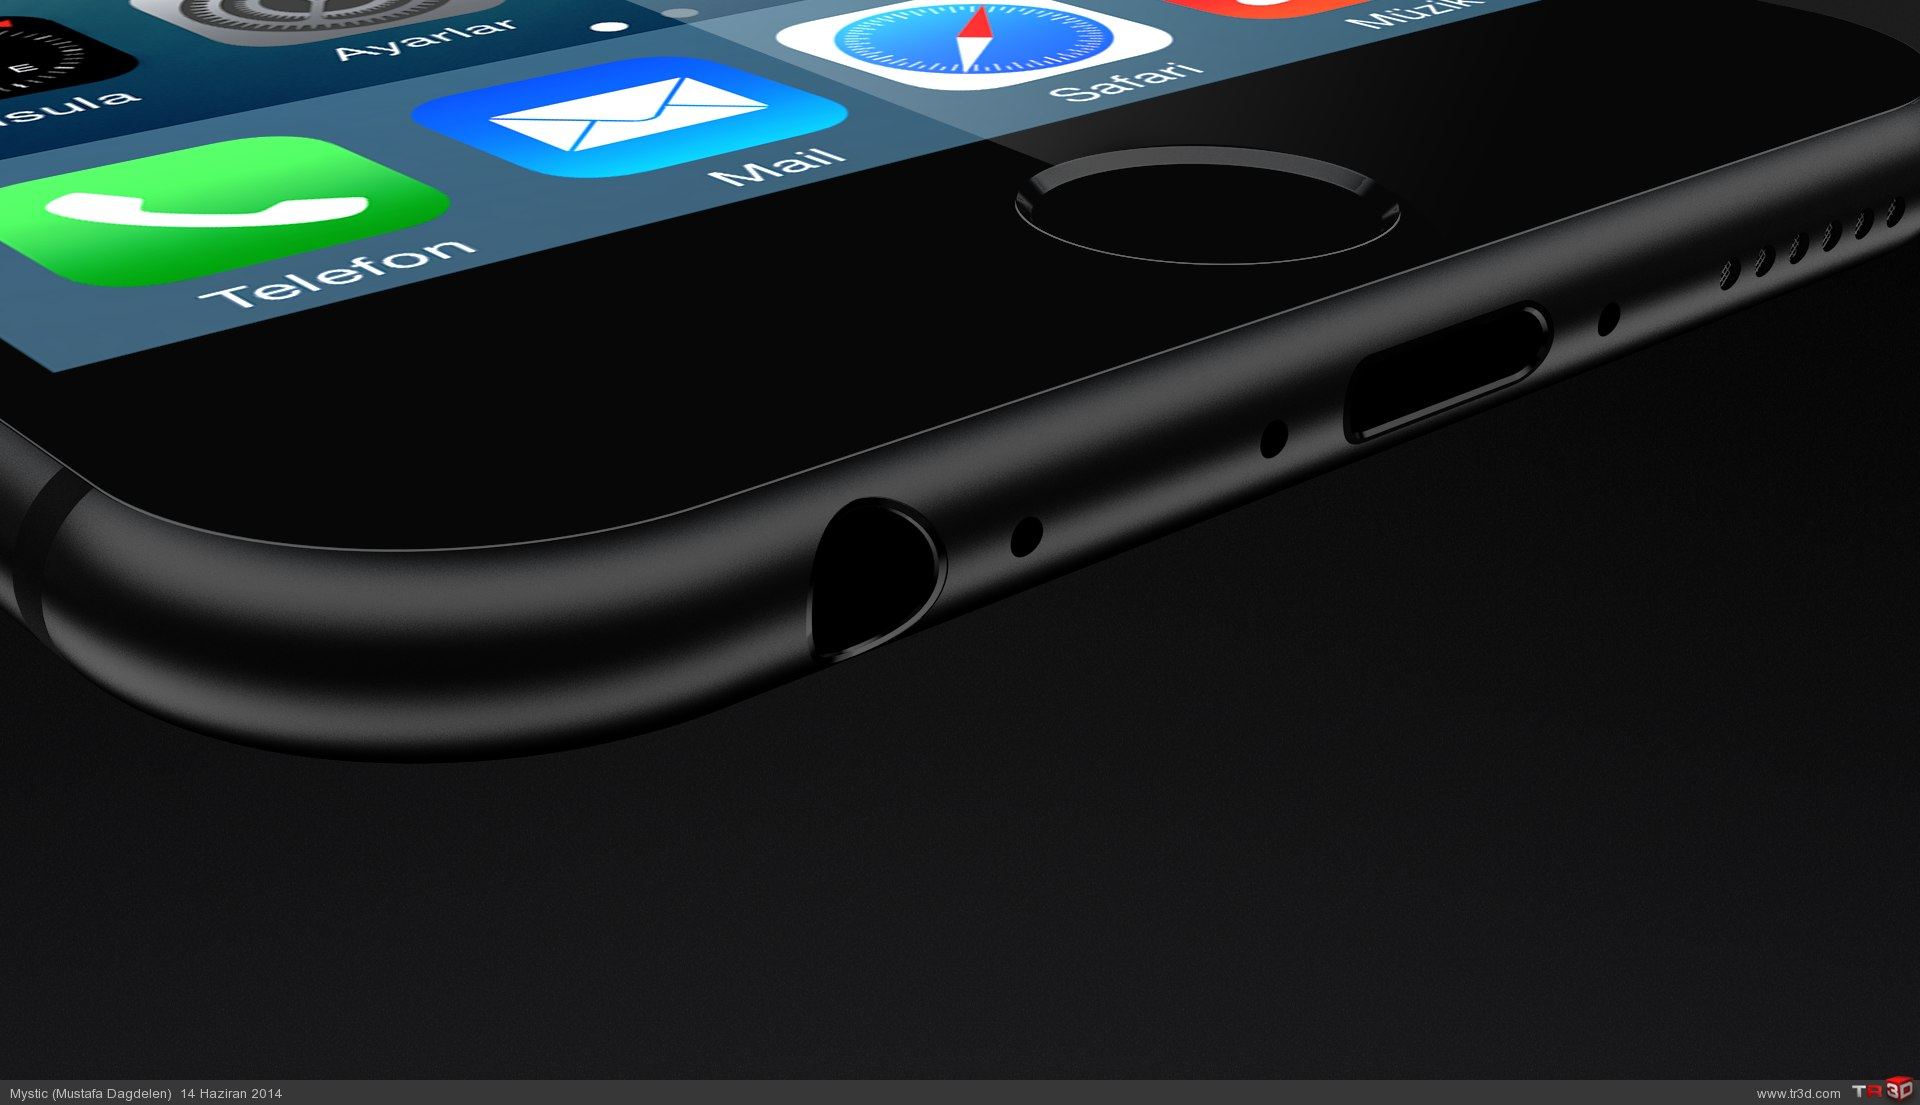 Apple iPhone 6 Finally 2